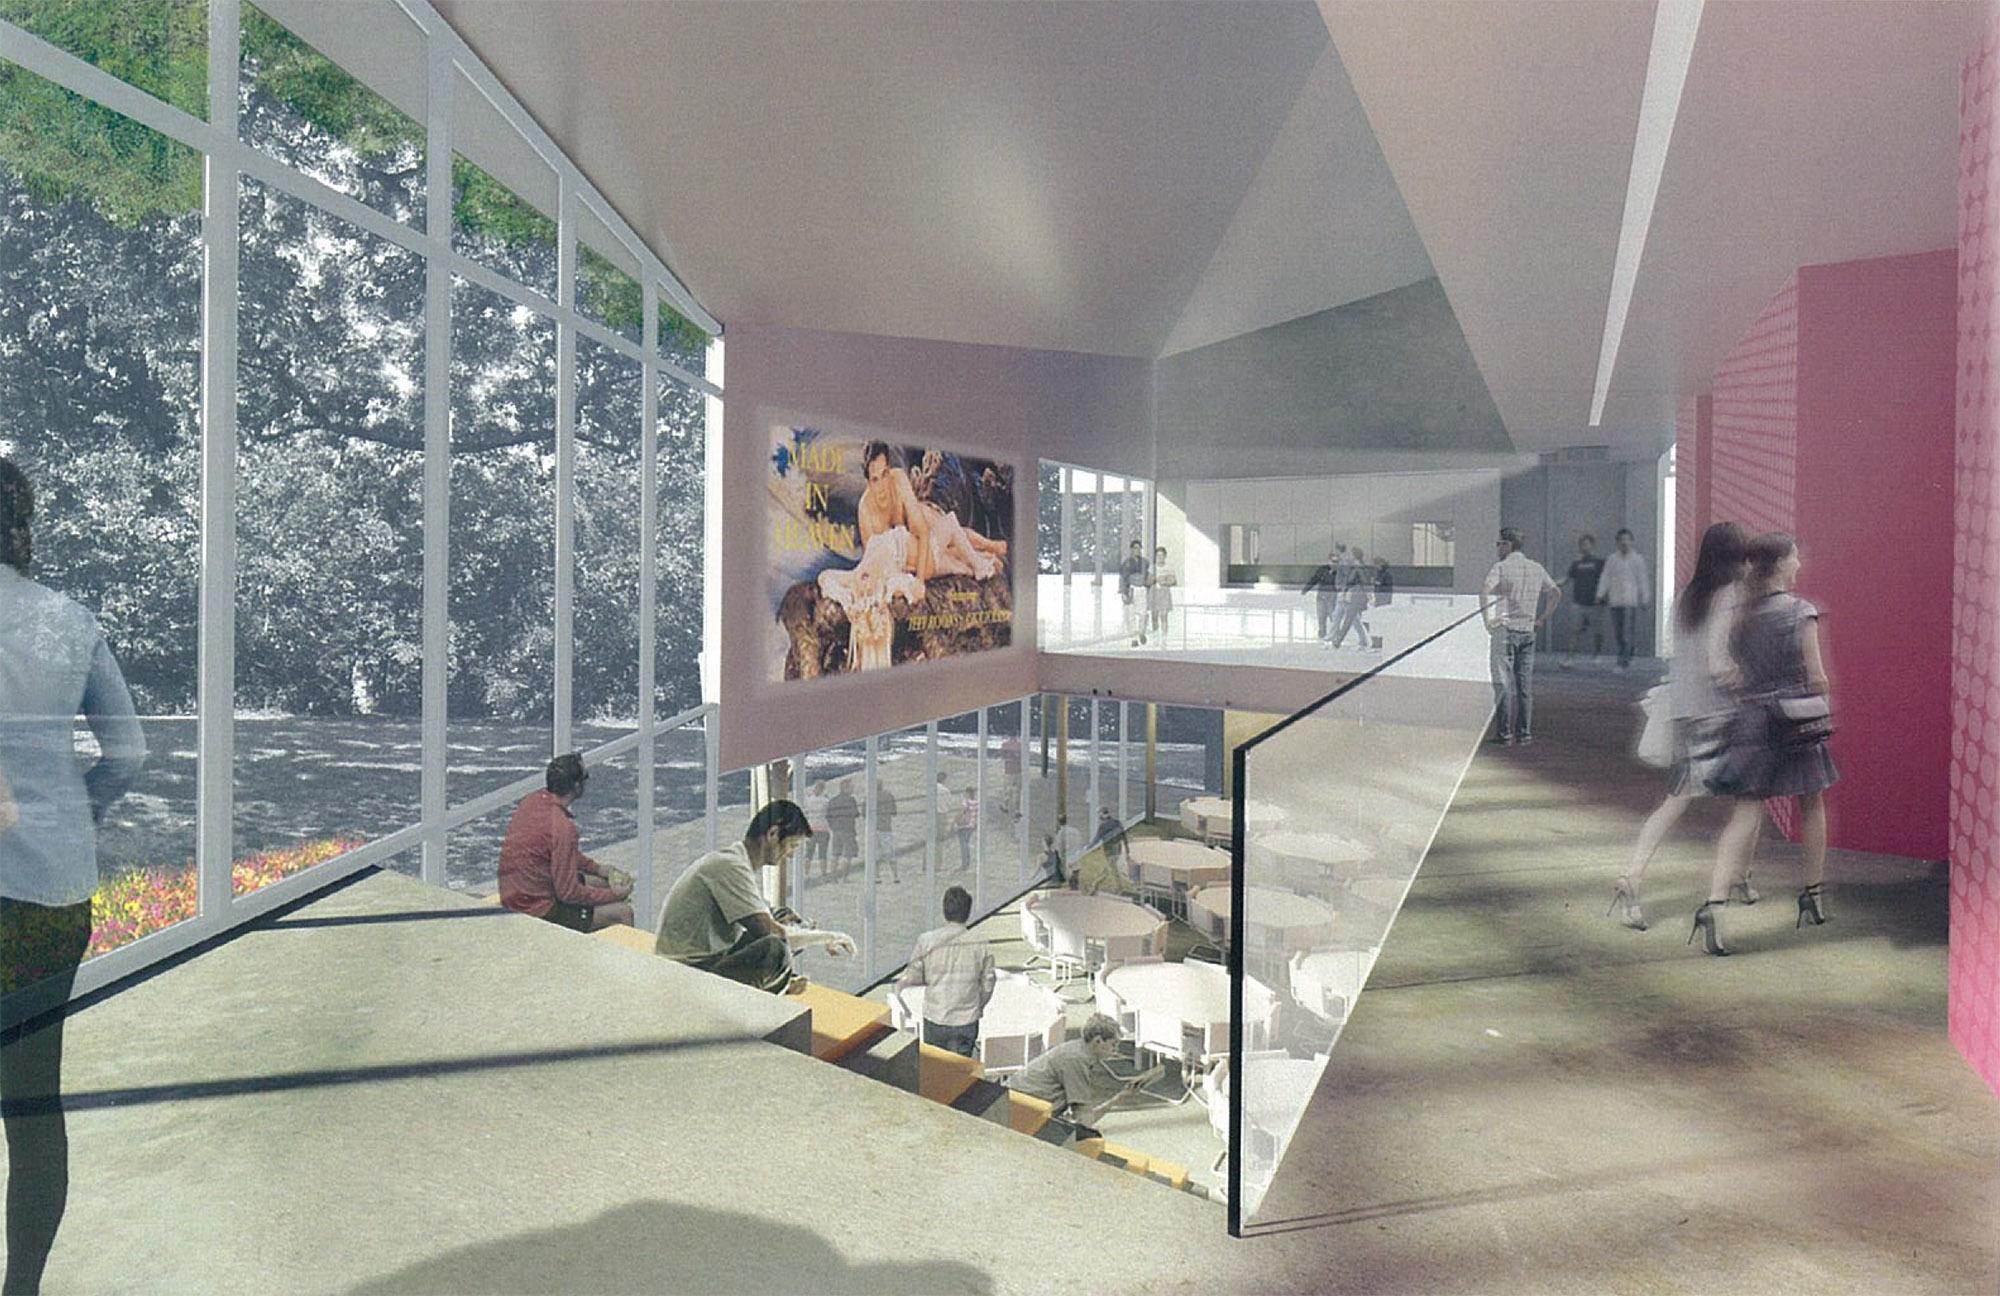 The Hedge, a proposed Baptist Mission Center serving the University of Arkansas. (Schematic design; unbuilt)